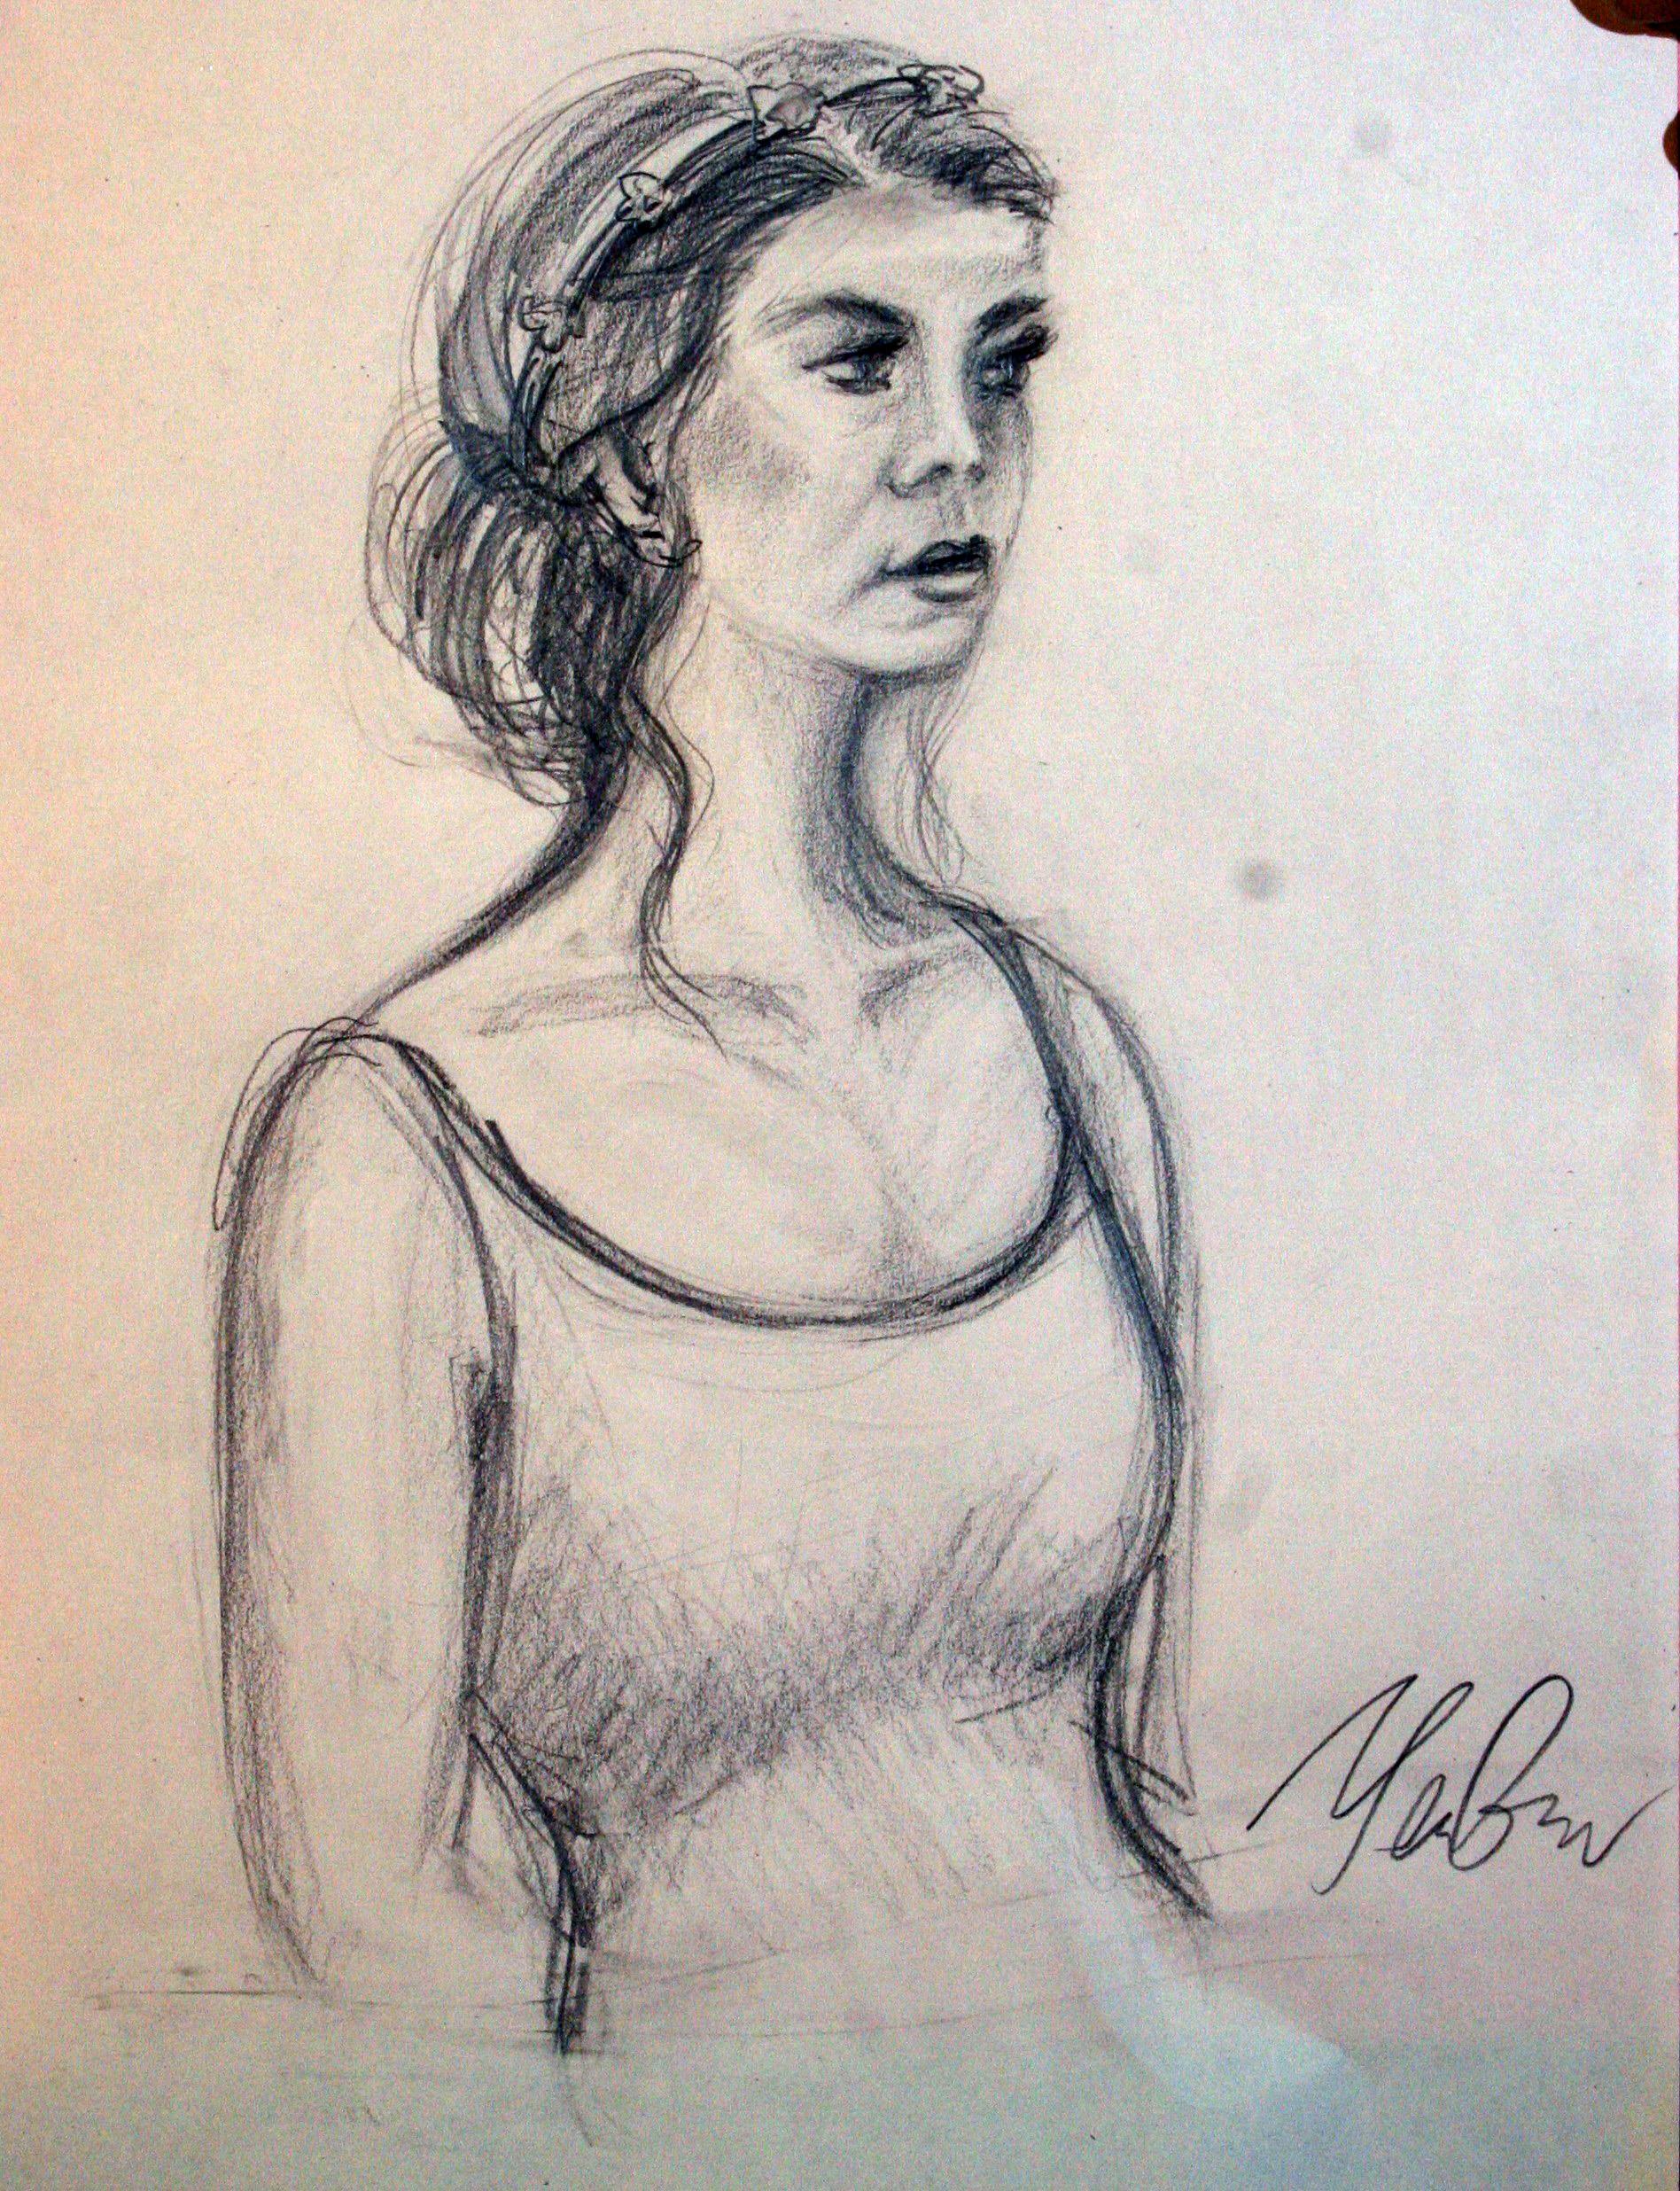 Yelena Ganyukov did this drawing.